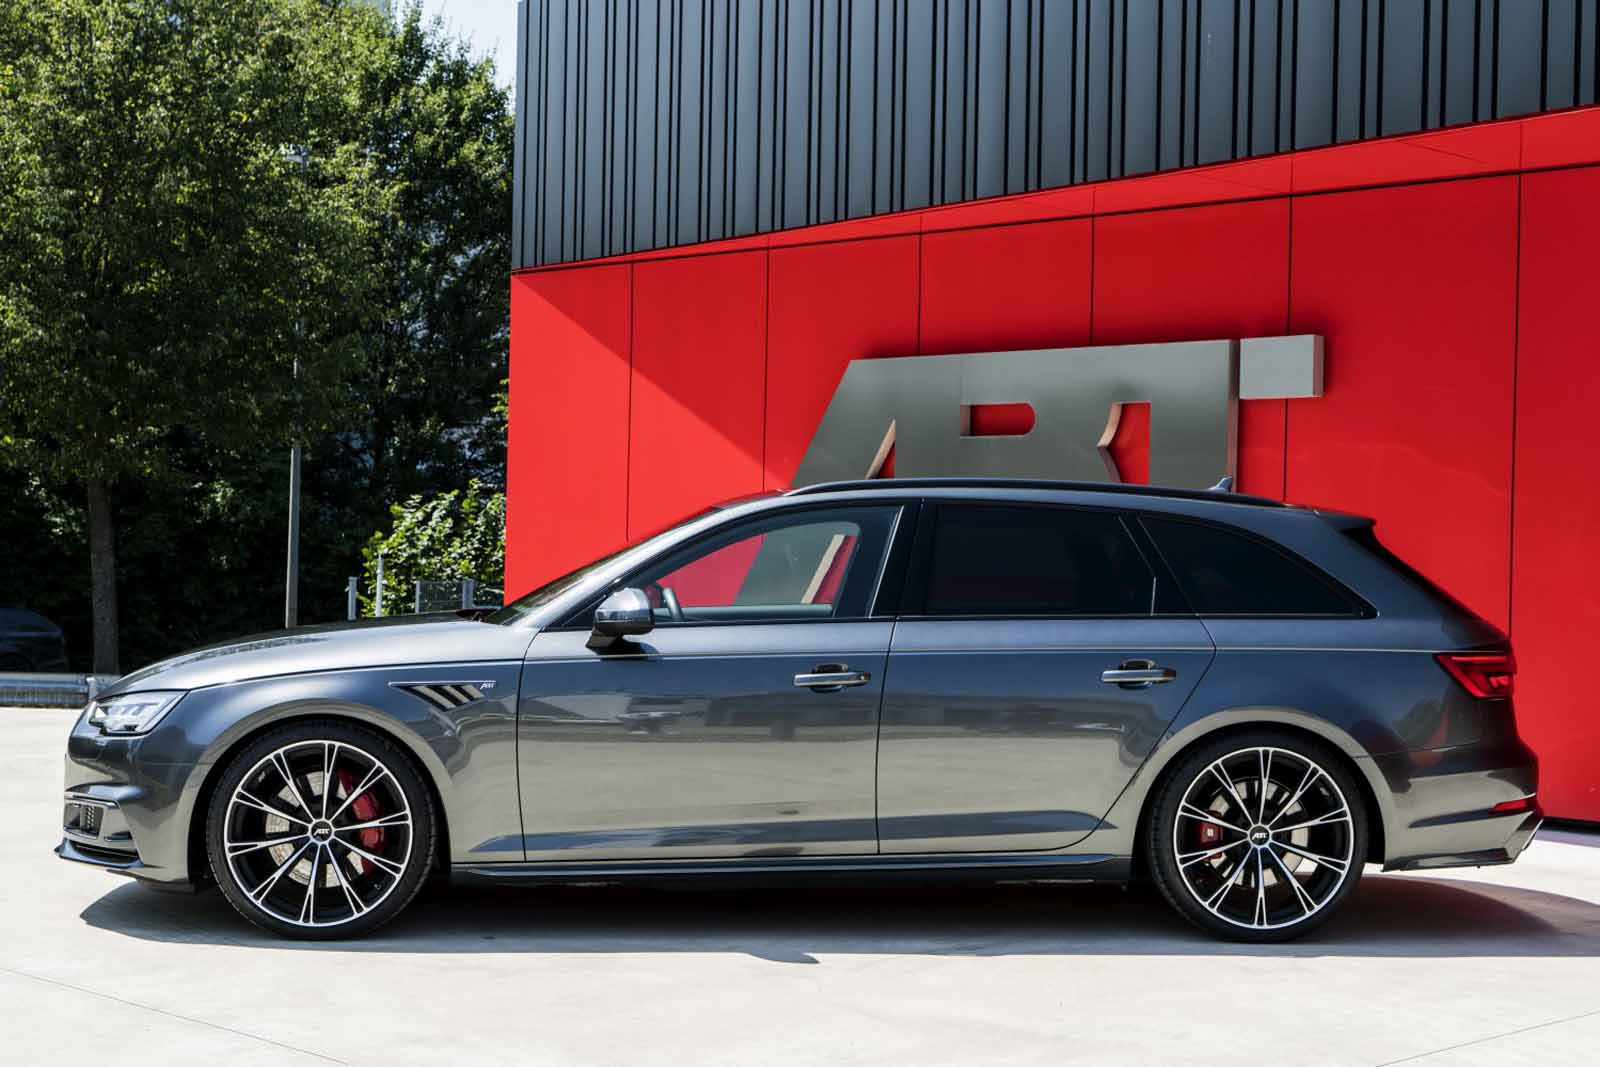 Audi Tt Tts A3 S3 Carbon Fiber Cold Air Intake System